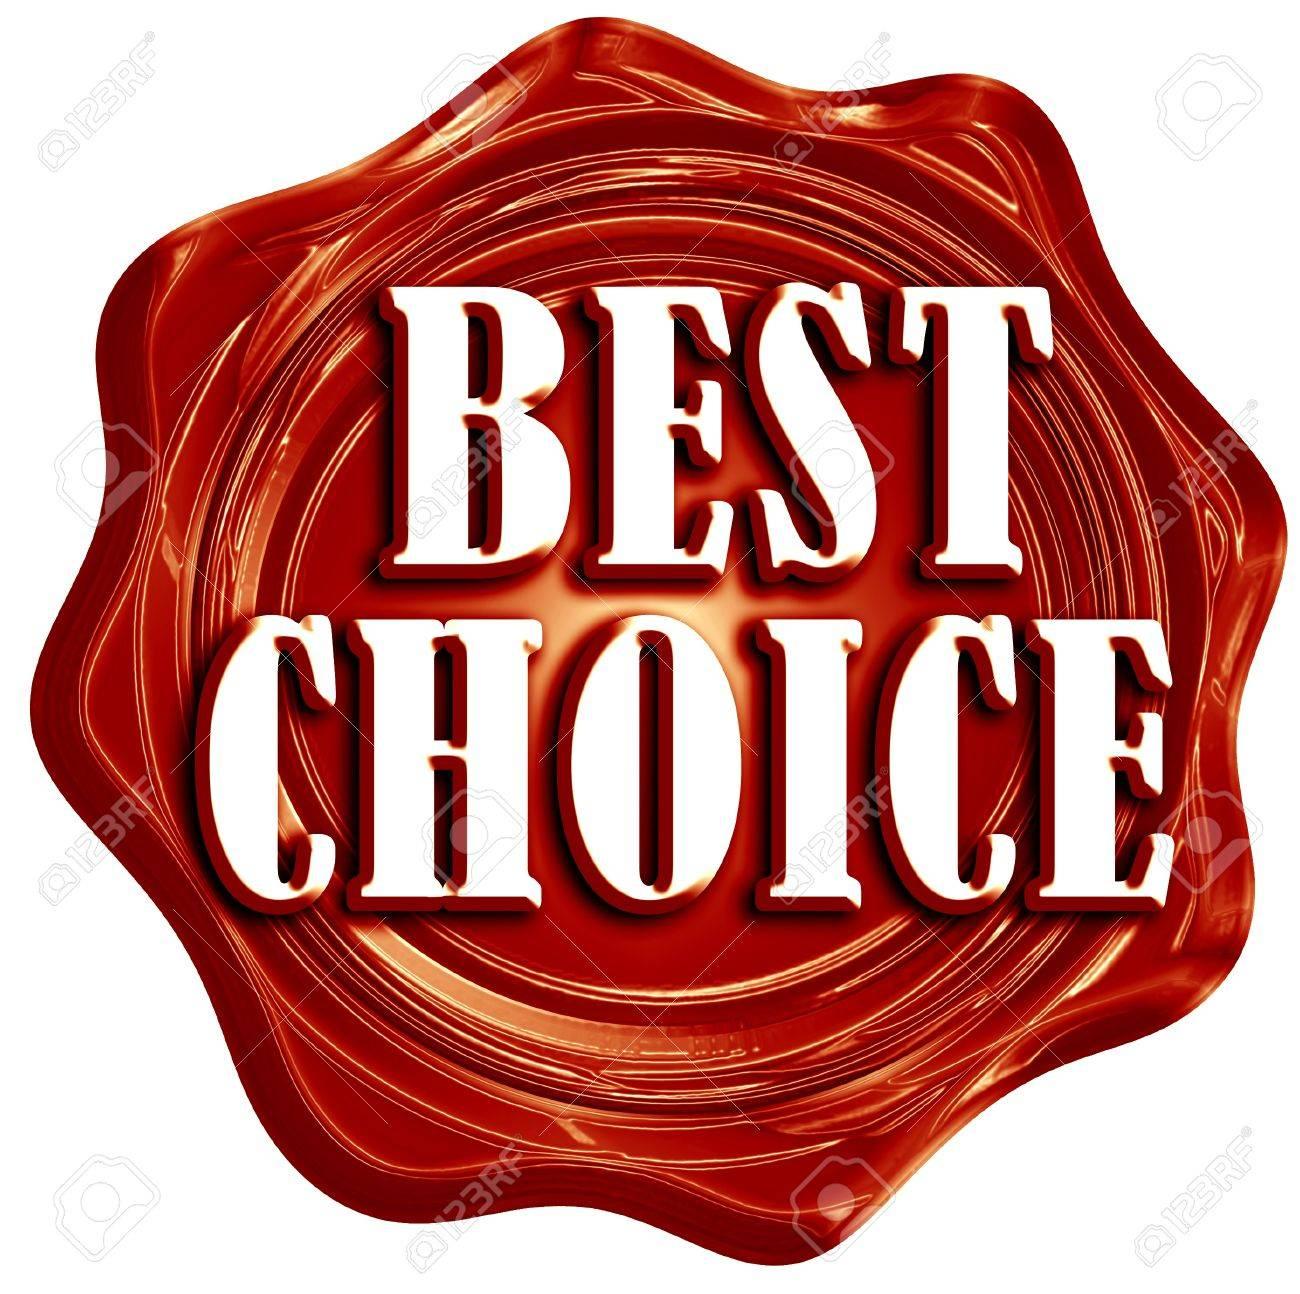 best choice st on wachs siegel stock foto.html